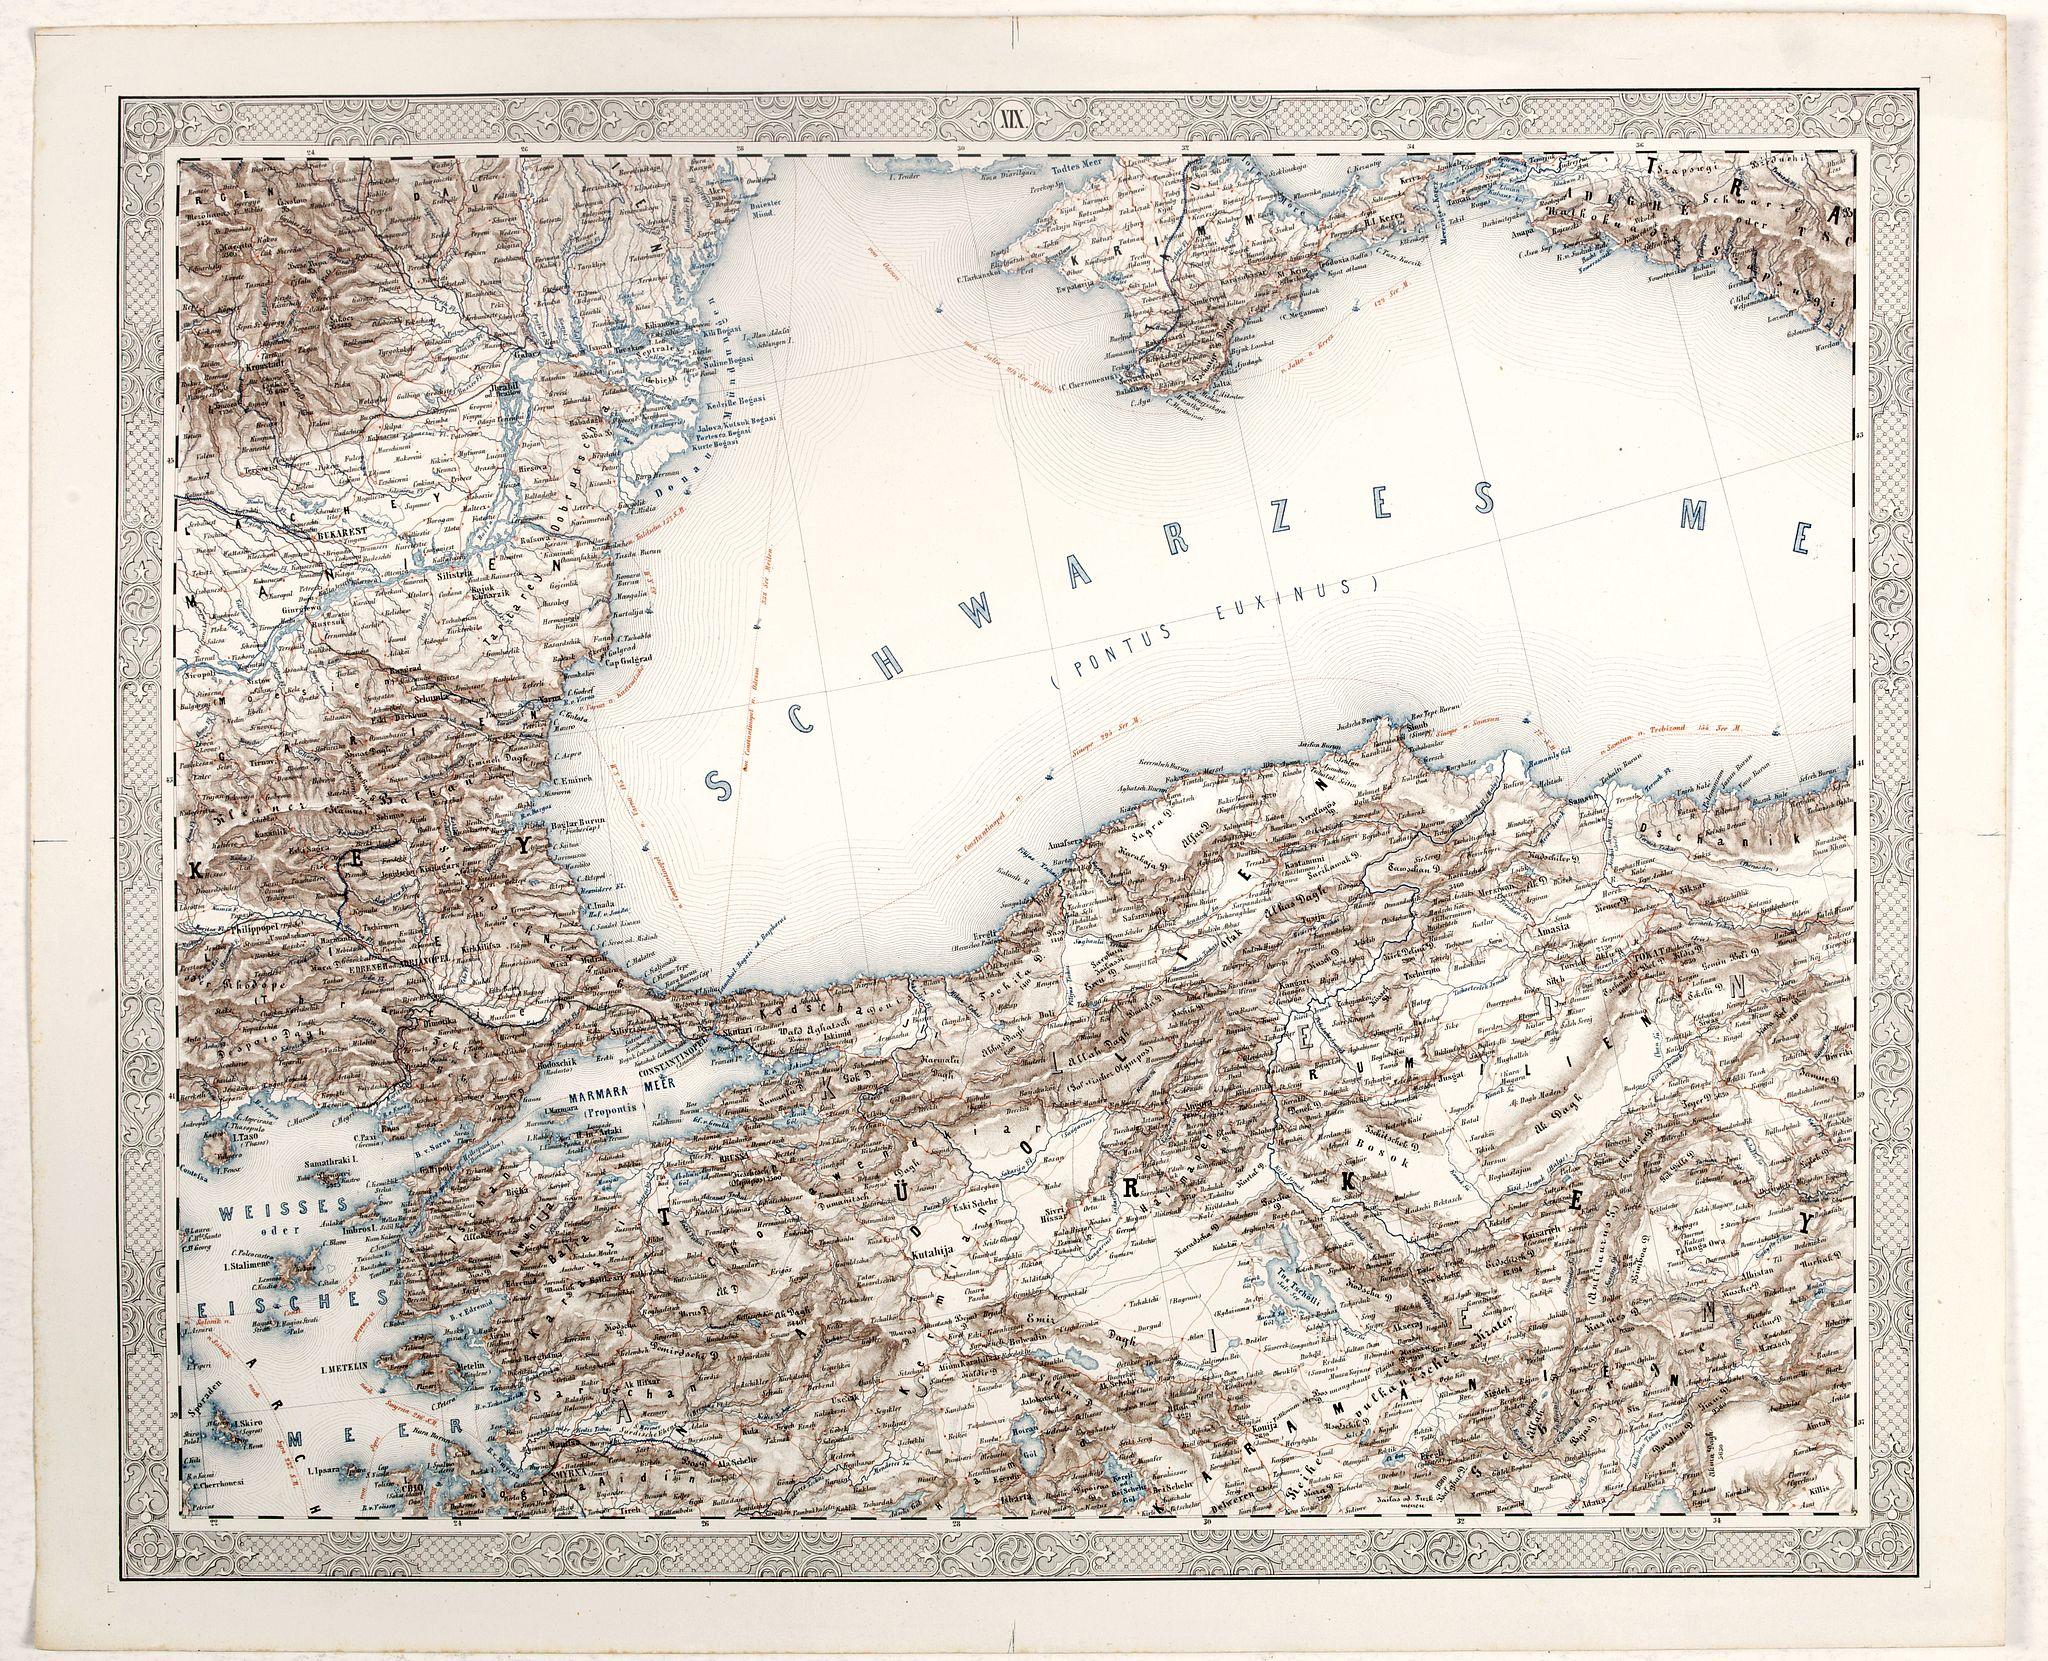 FLEMMING, C. -  [Schwarzes Meer] Nr 1